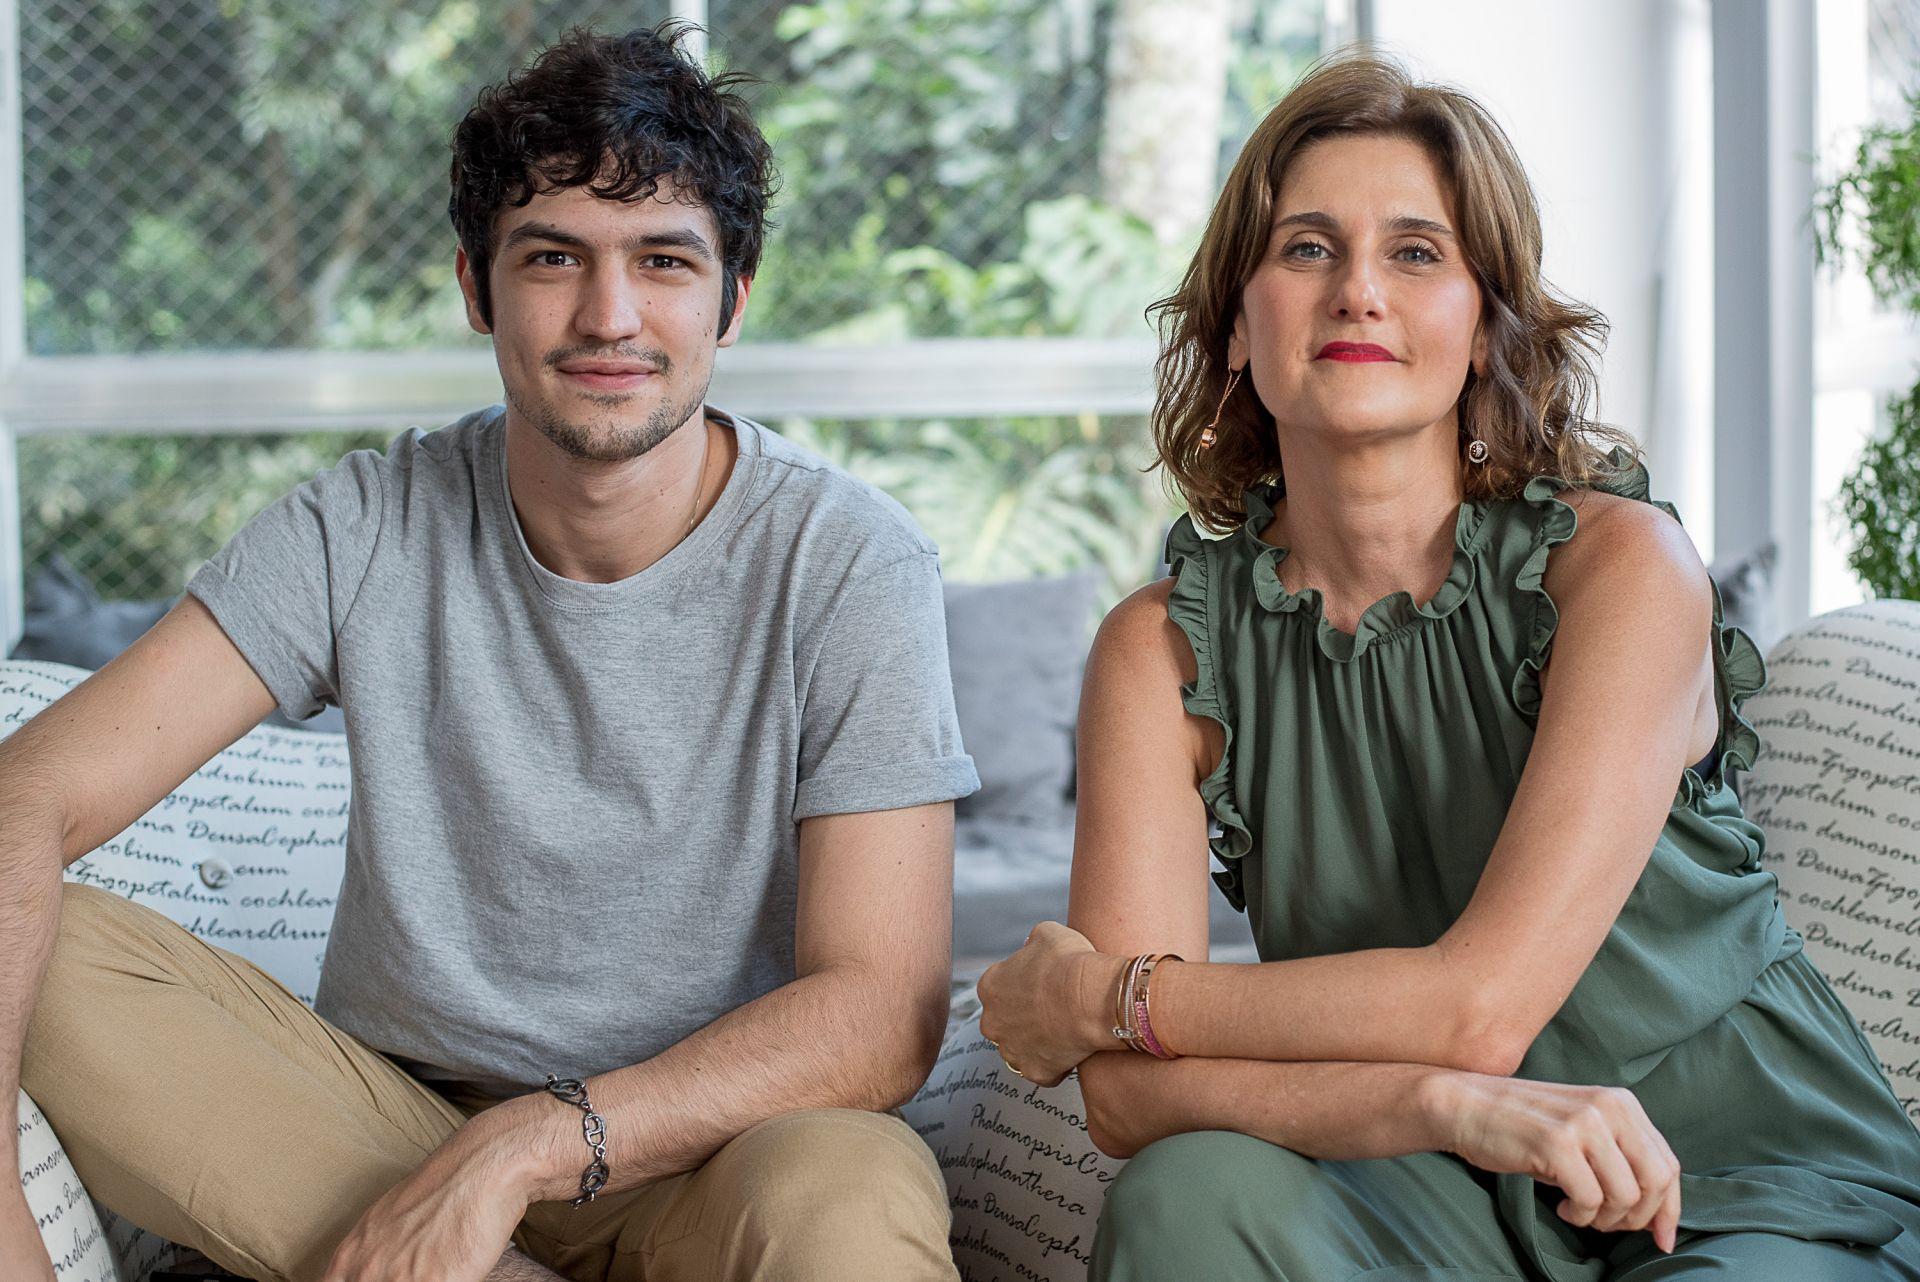 gabriel leone canal brasil cinejornal simone zuccolotto